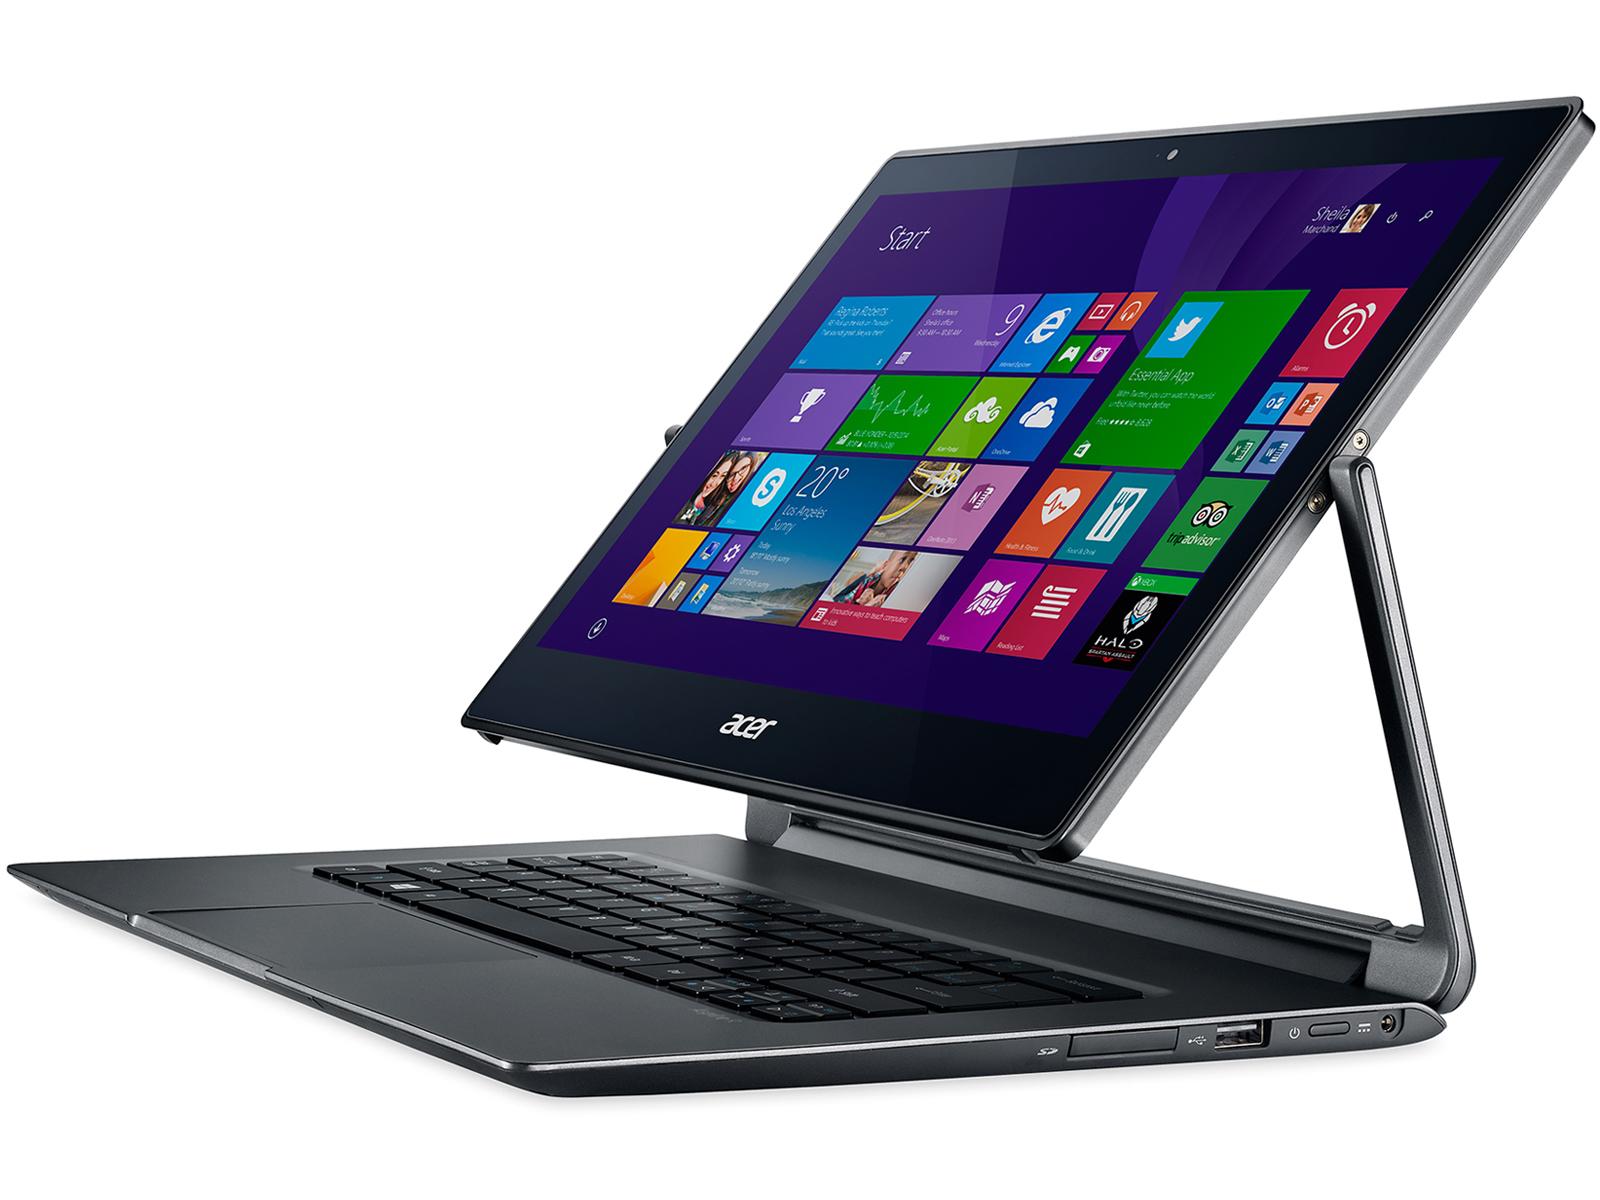 Asus VivoBook S X510UA (7100U, HD) Laptop Review